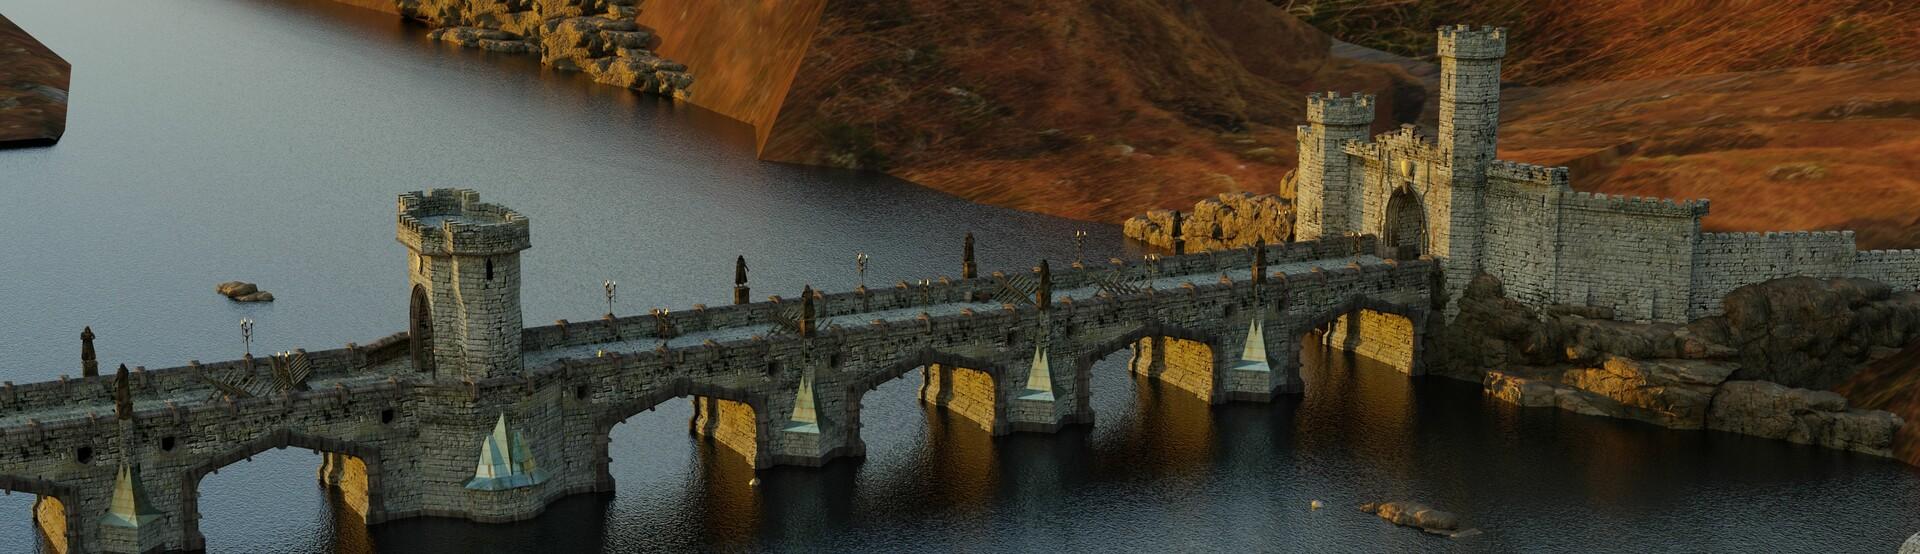 Jasza dobrzanski bridge design render